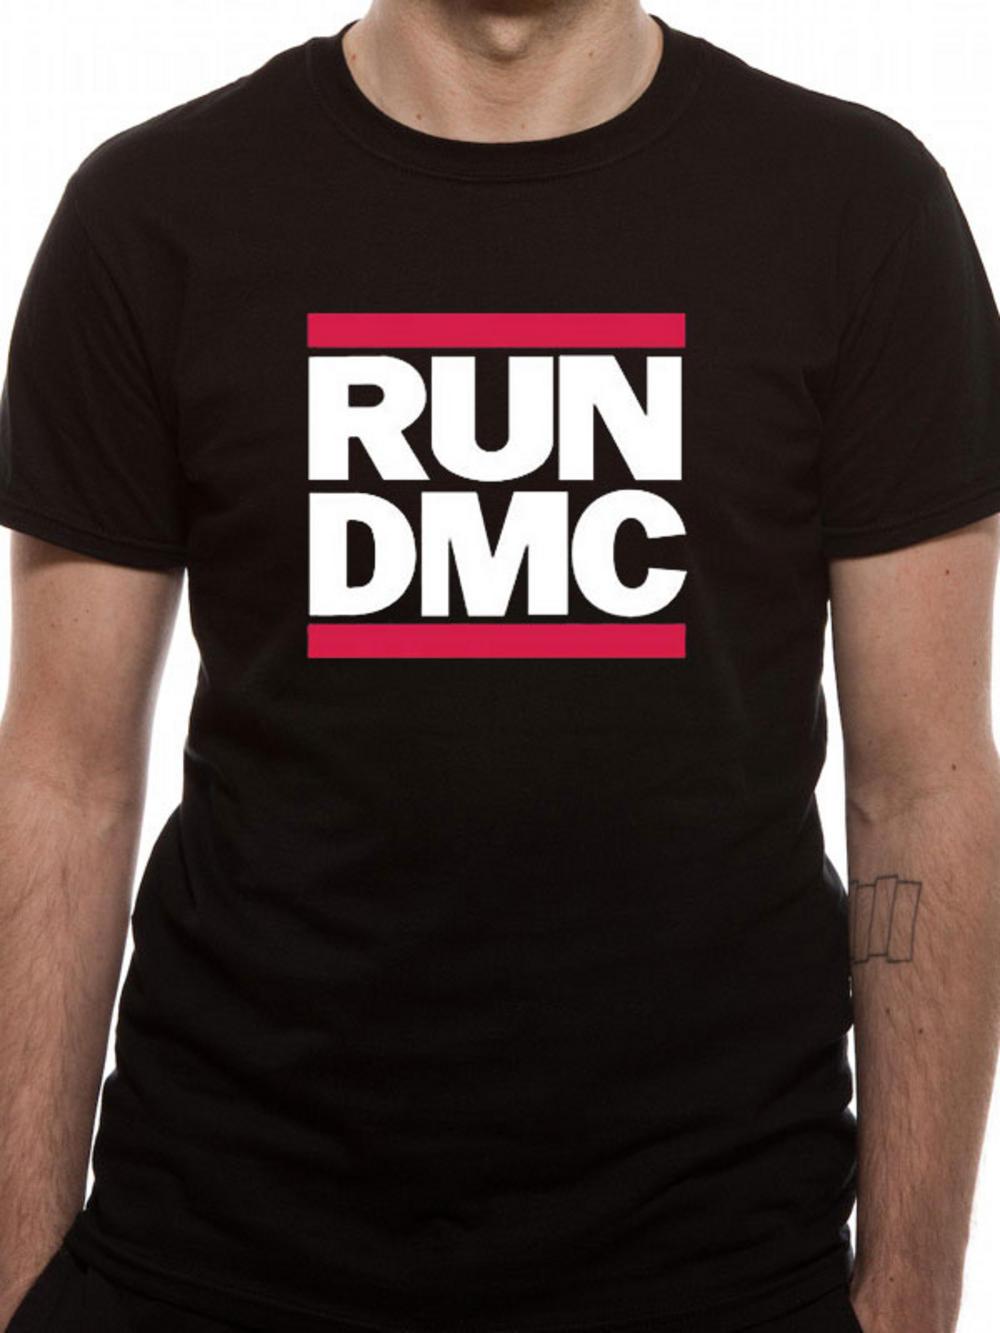 run dmc logo t shirt tm shop. Black Bedroom Furniture Sets. Home Design Ideas